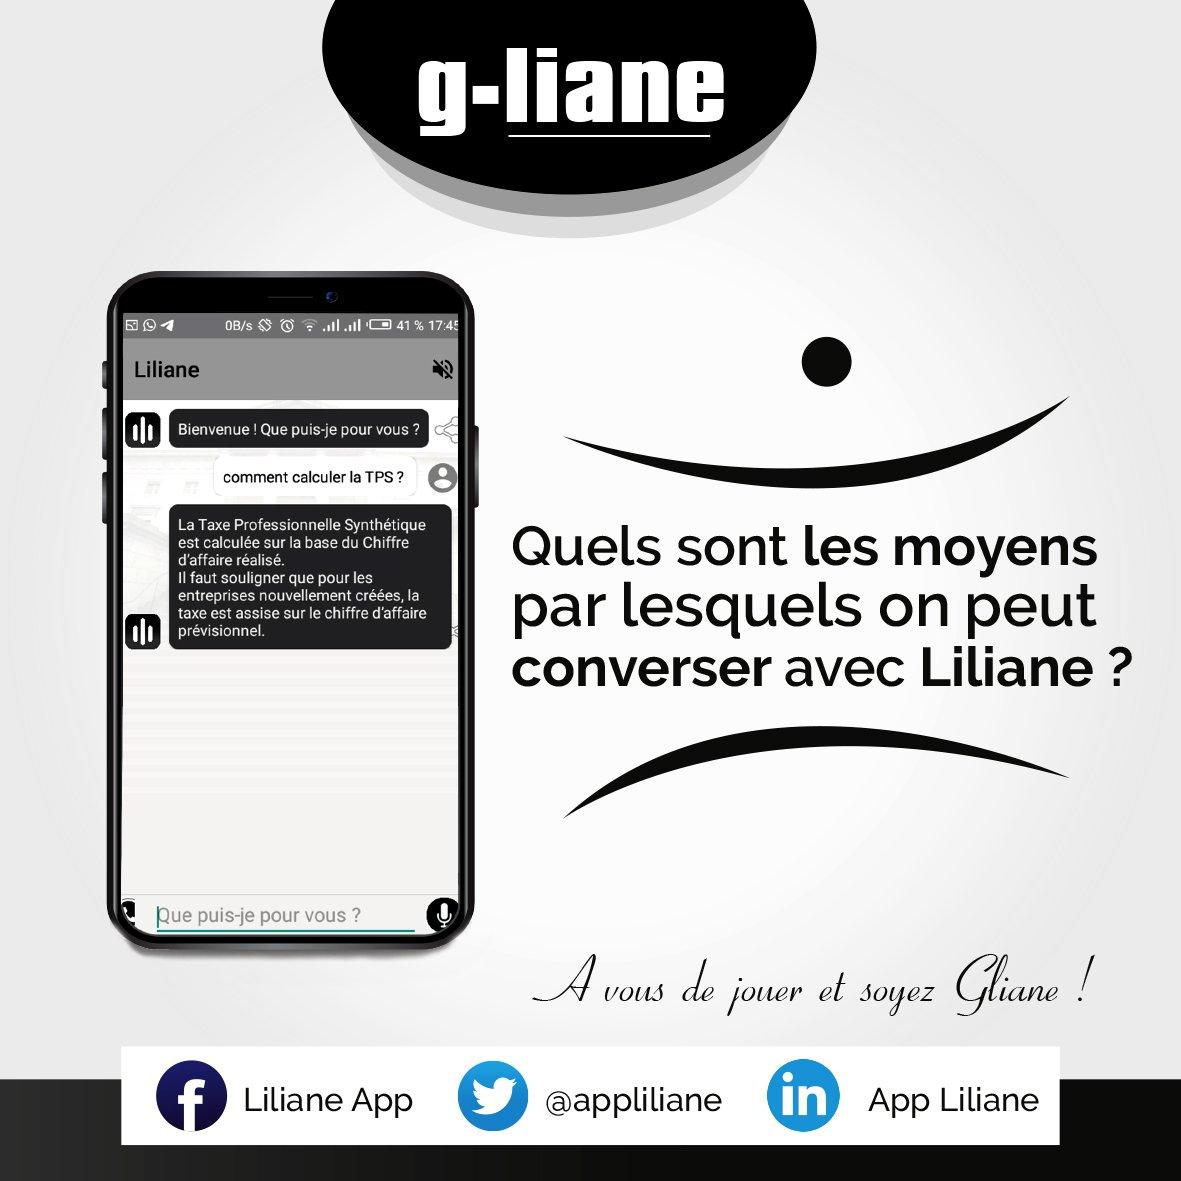 Si tu aimes #Liliane, tu es #gliane! Si tu gagnes, on va te gâter ! https://t.co/6FVfdm4814